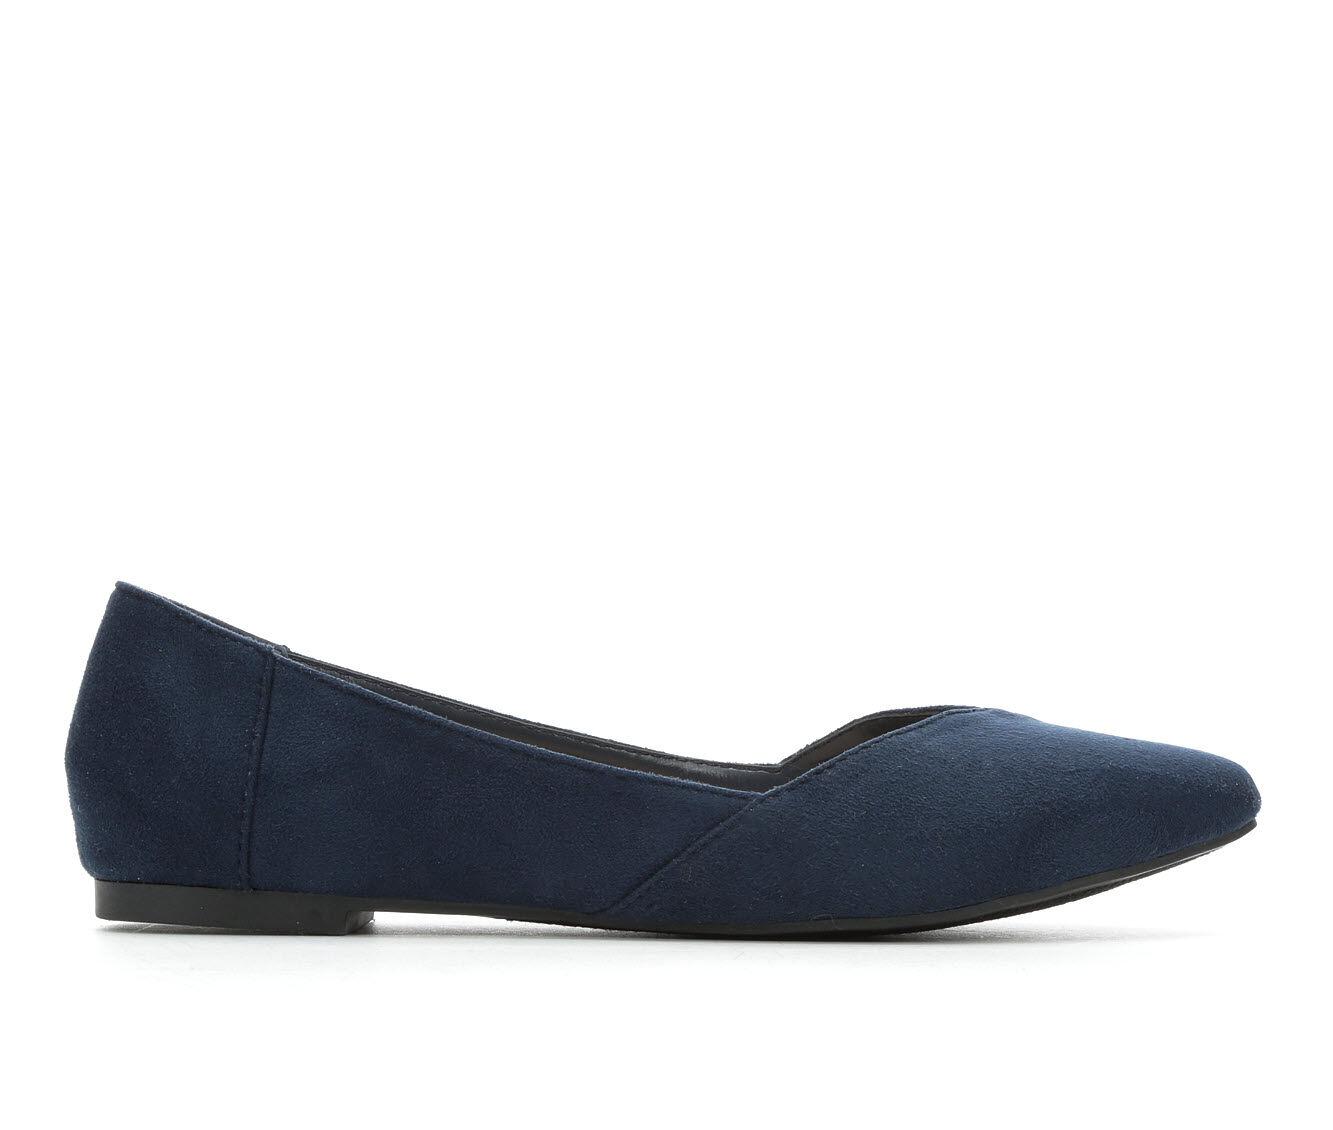 uk shoes_kd4087